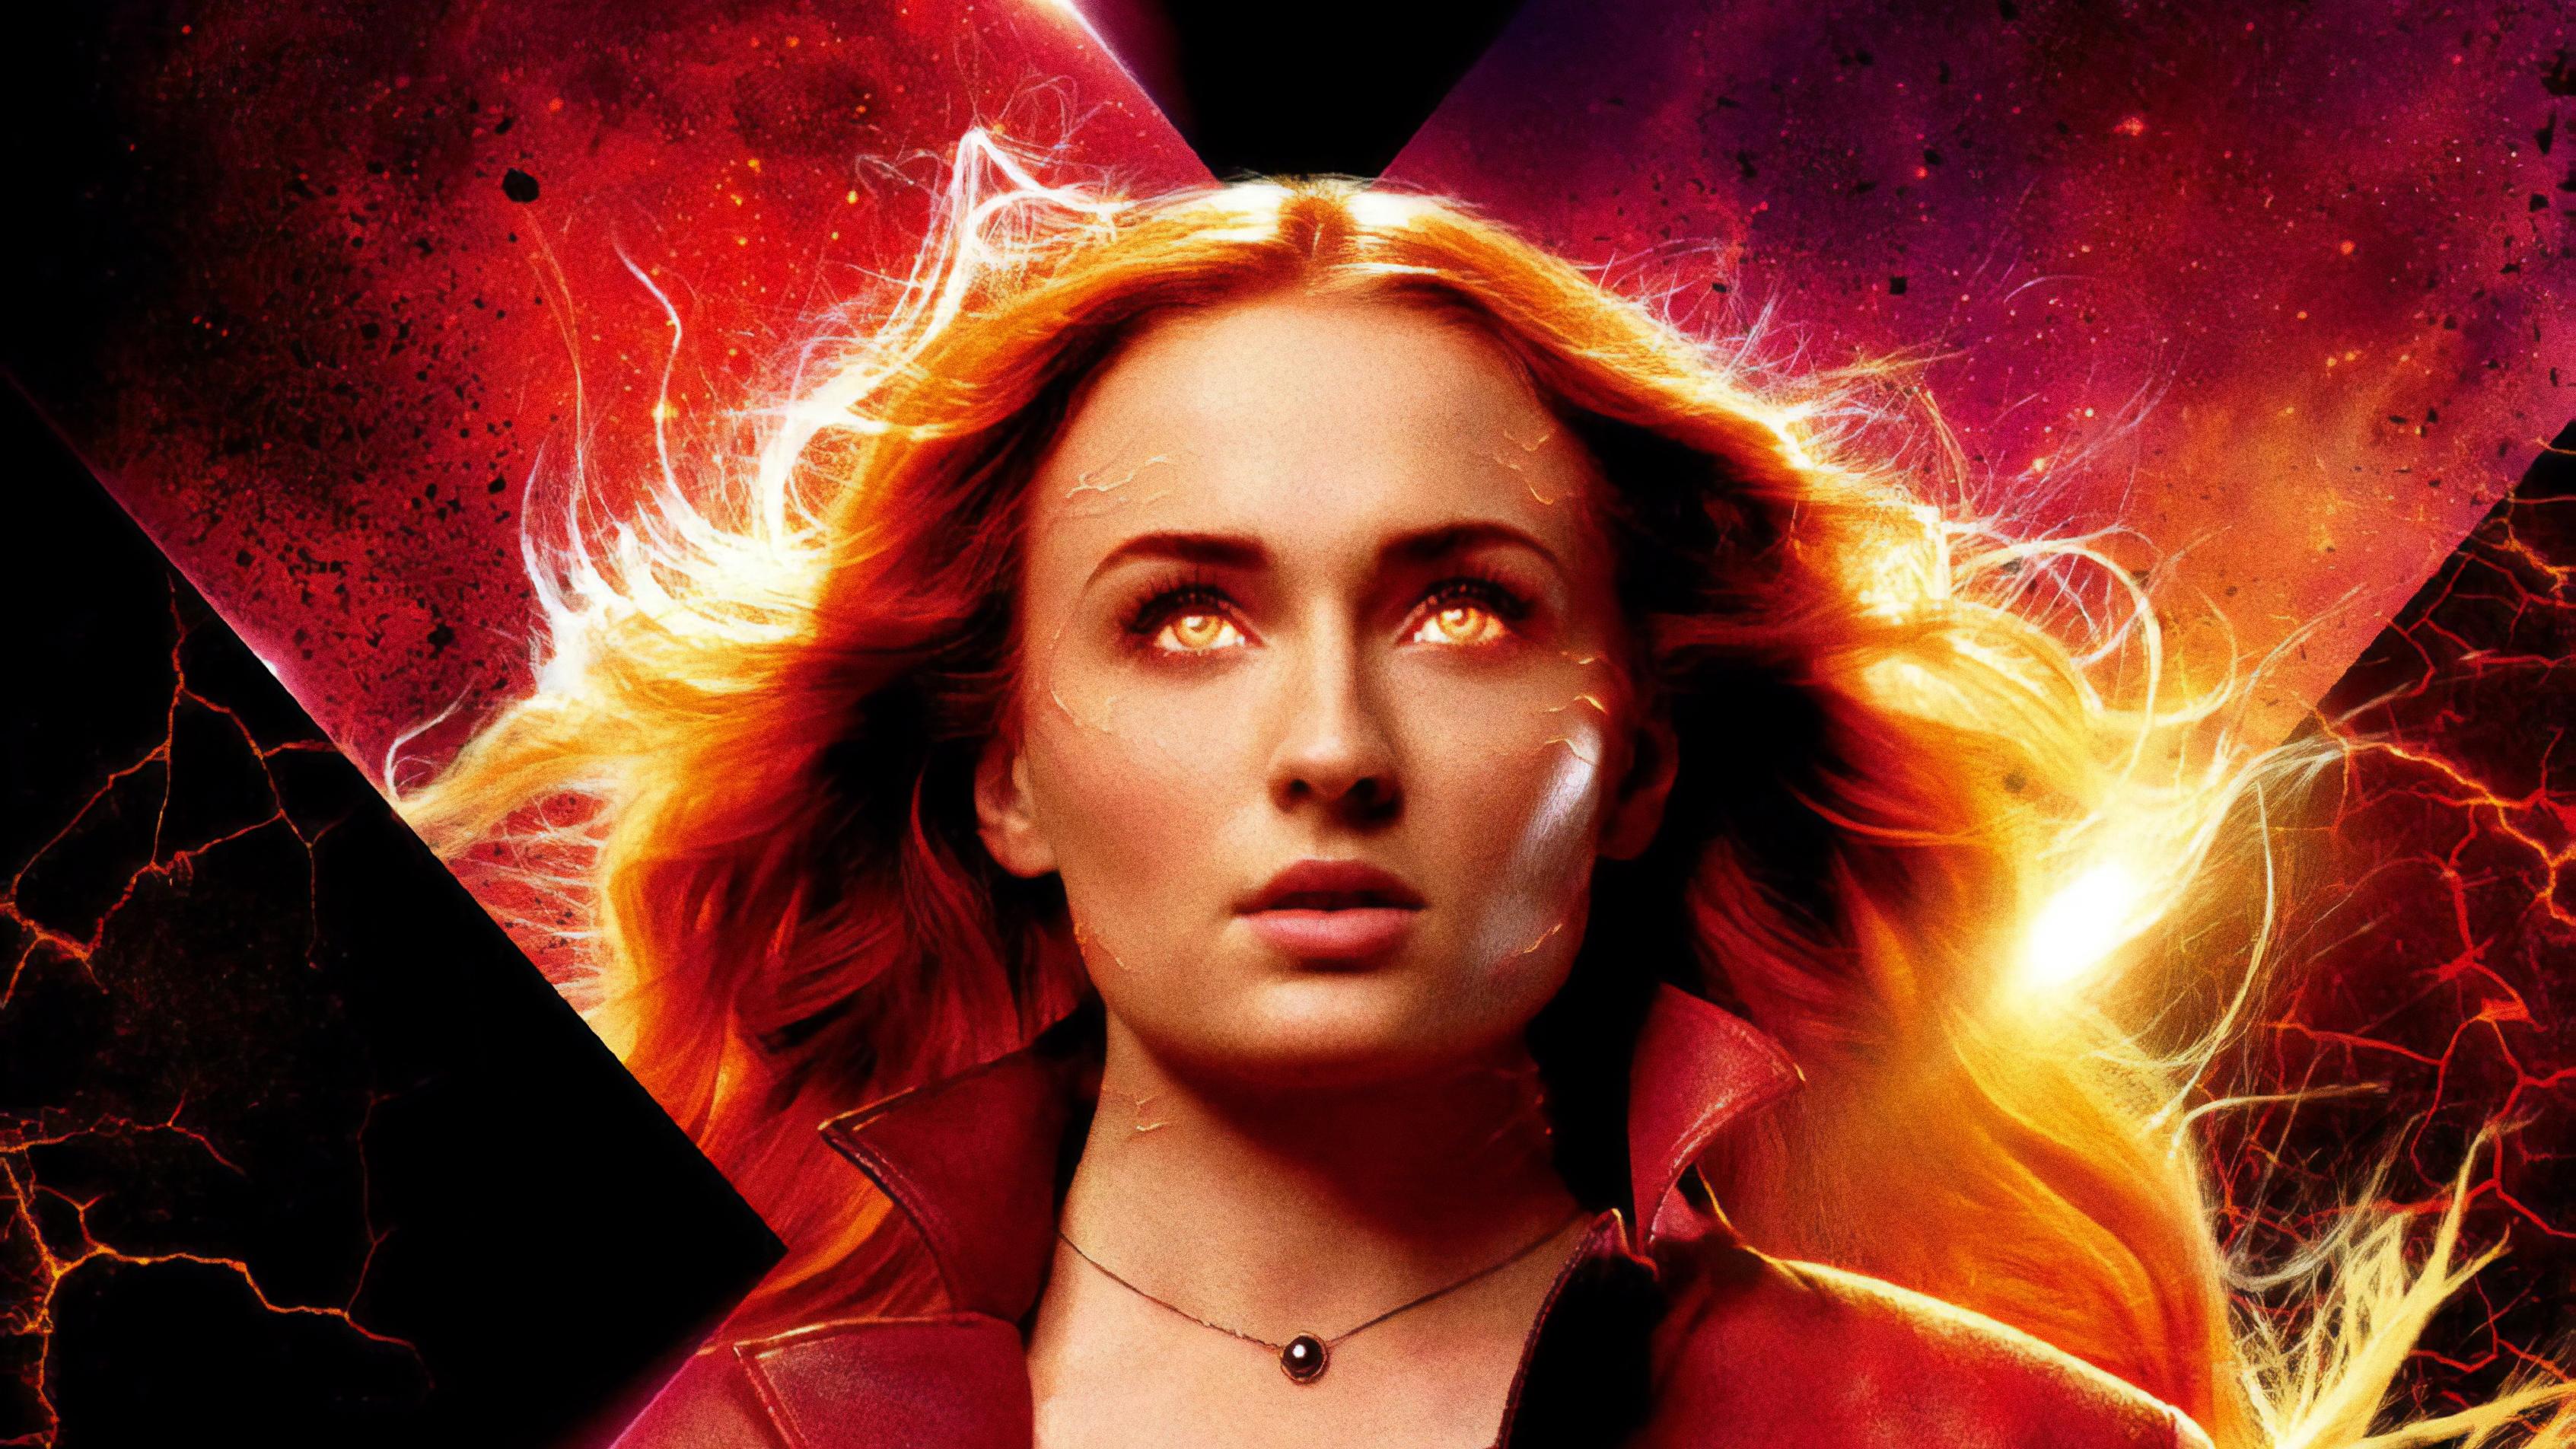 Jean Grey X Men Dark Phoenix 4k Hd Movies 4k Wallpapers